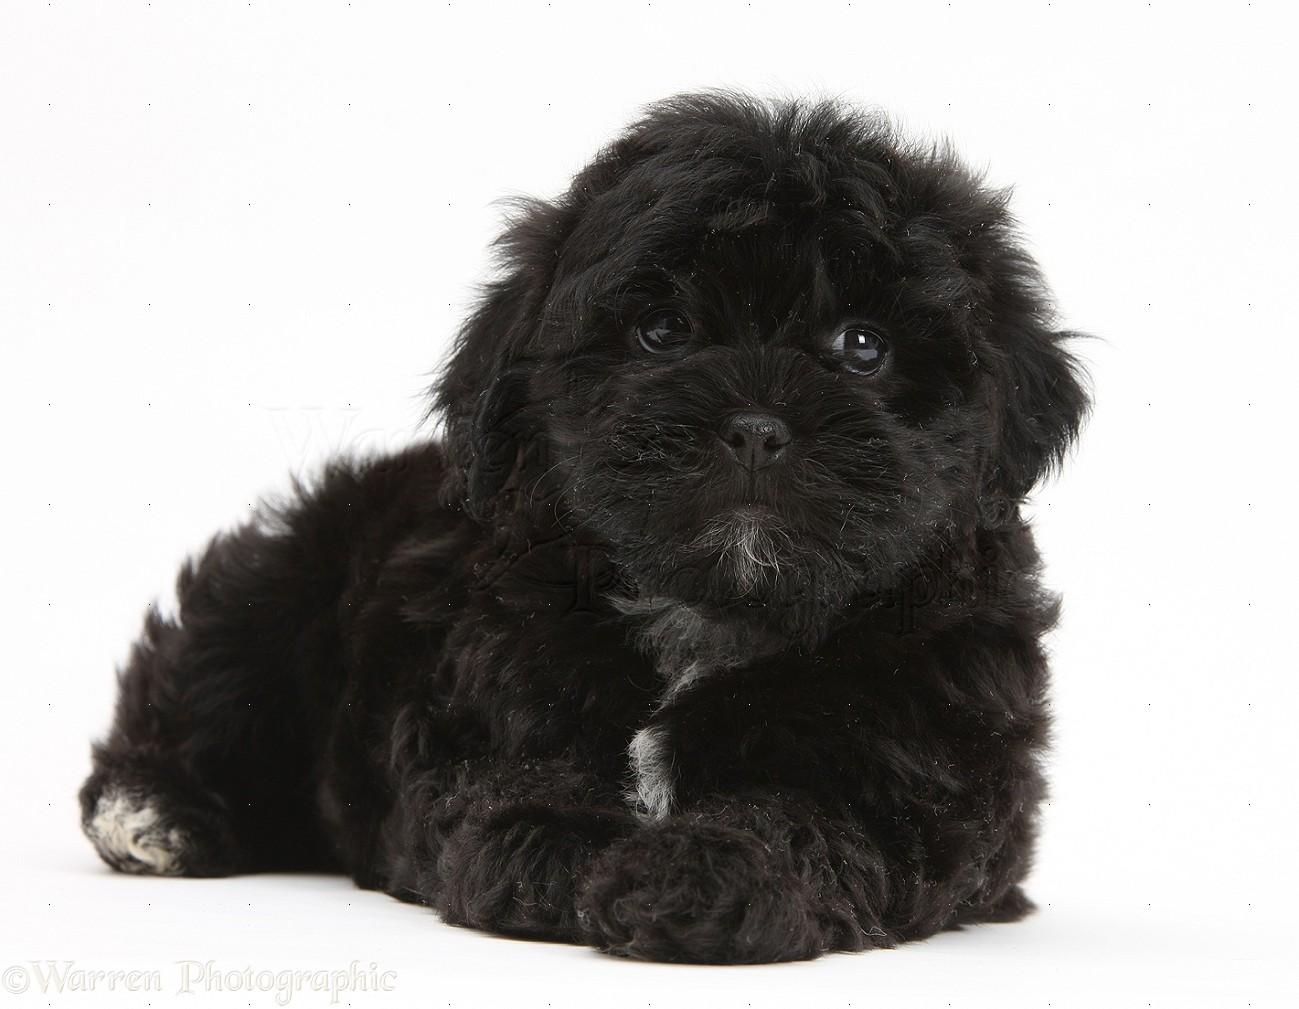 Dog: Black Pooshi (Poodle x Shih-Tzu) pup photo - WP18791 Black And White Short Hair Chihuahua